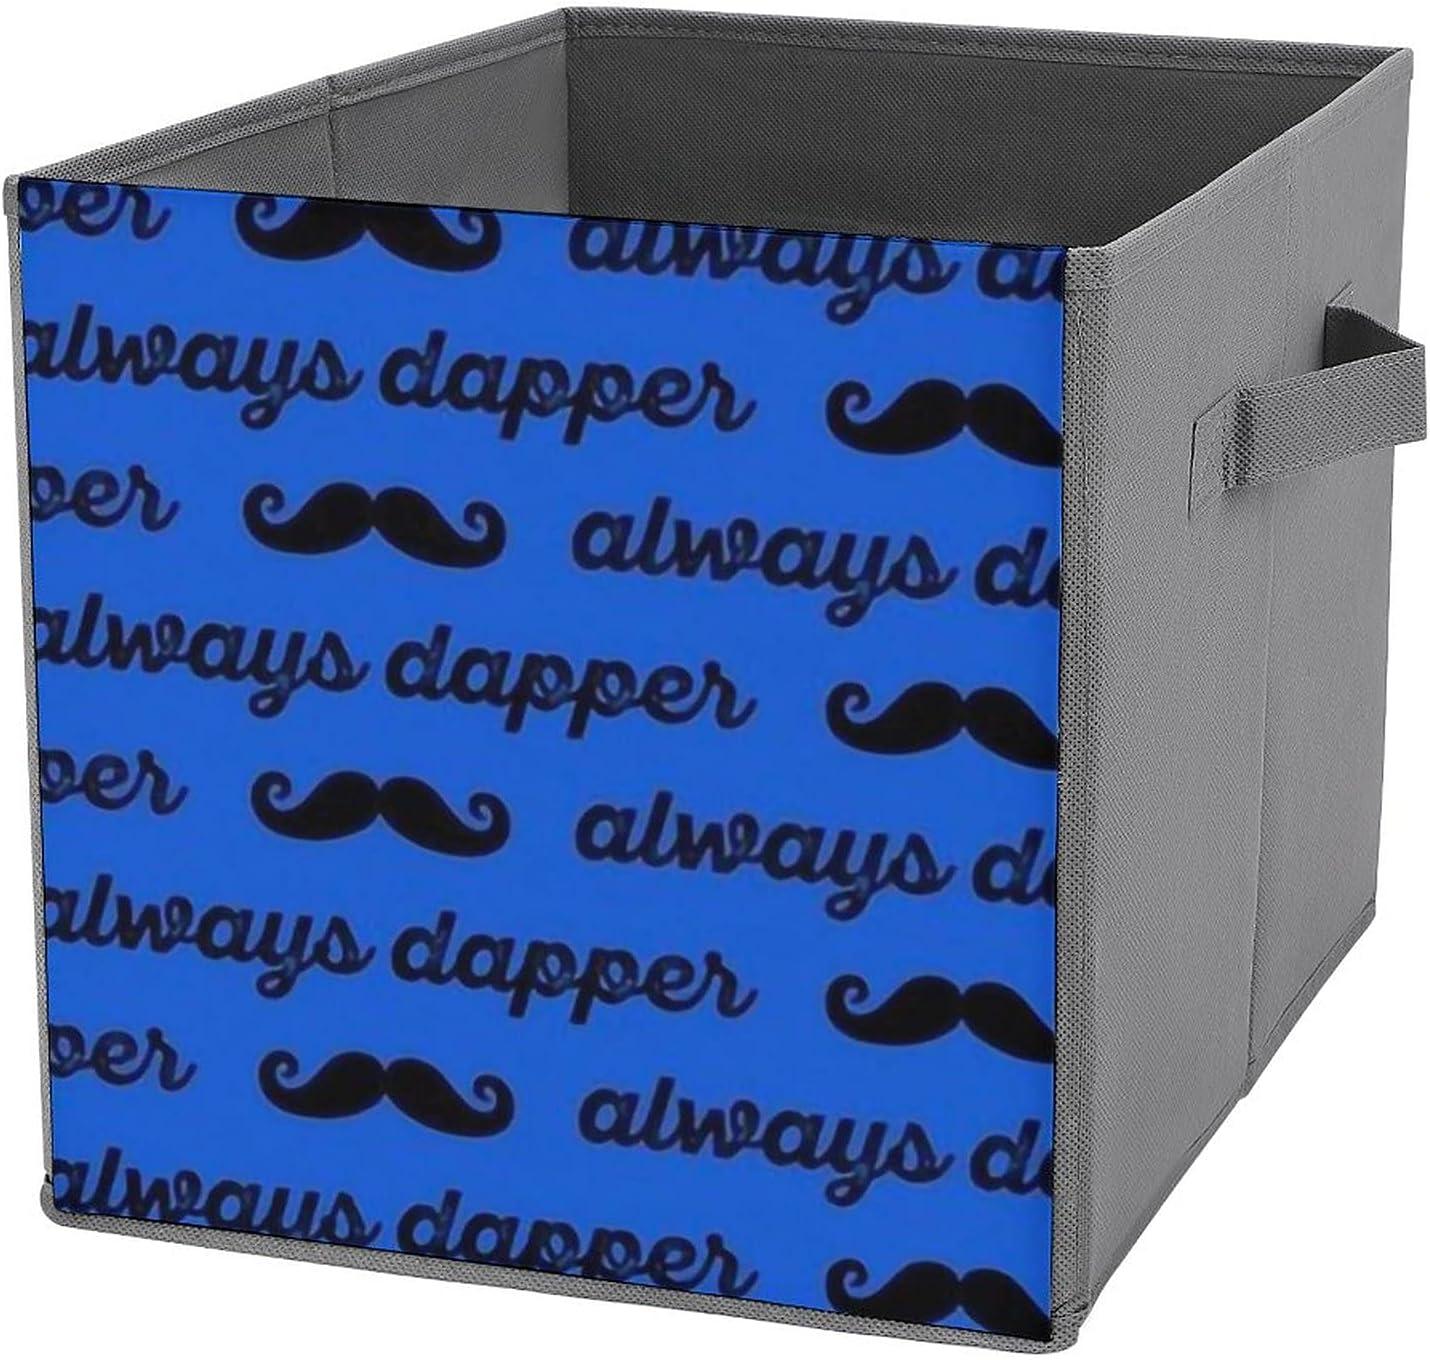 MMJUI Always Dapper Mustaches Black It is very popular Blue Folding on Storage Bins Oakland Mall